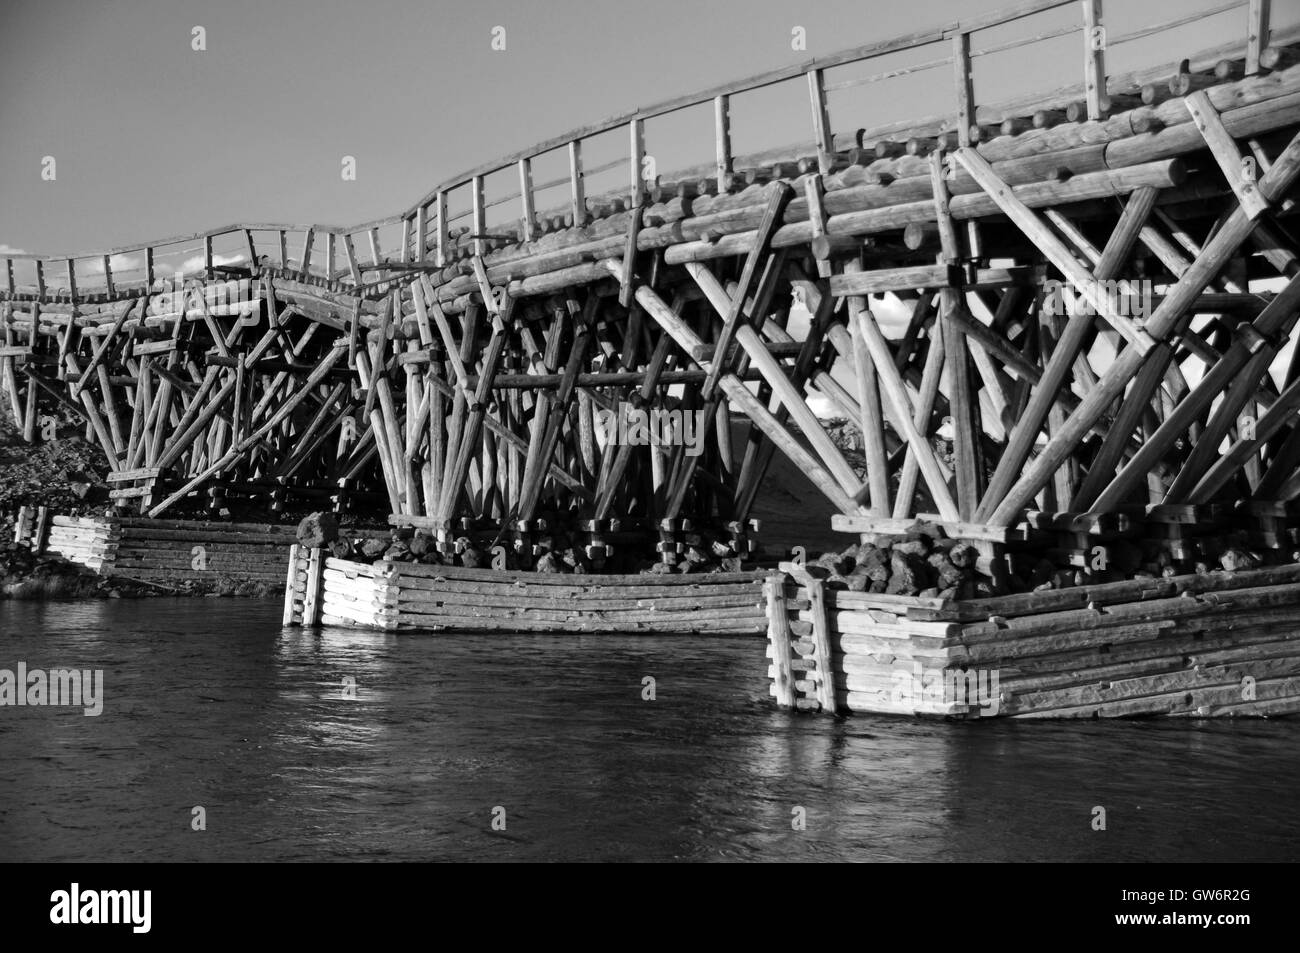 Wooden bridge over the Chuluut River, Mongolia - Stock Image